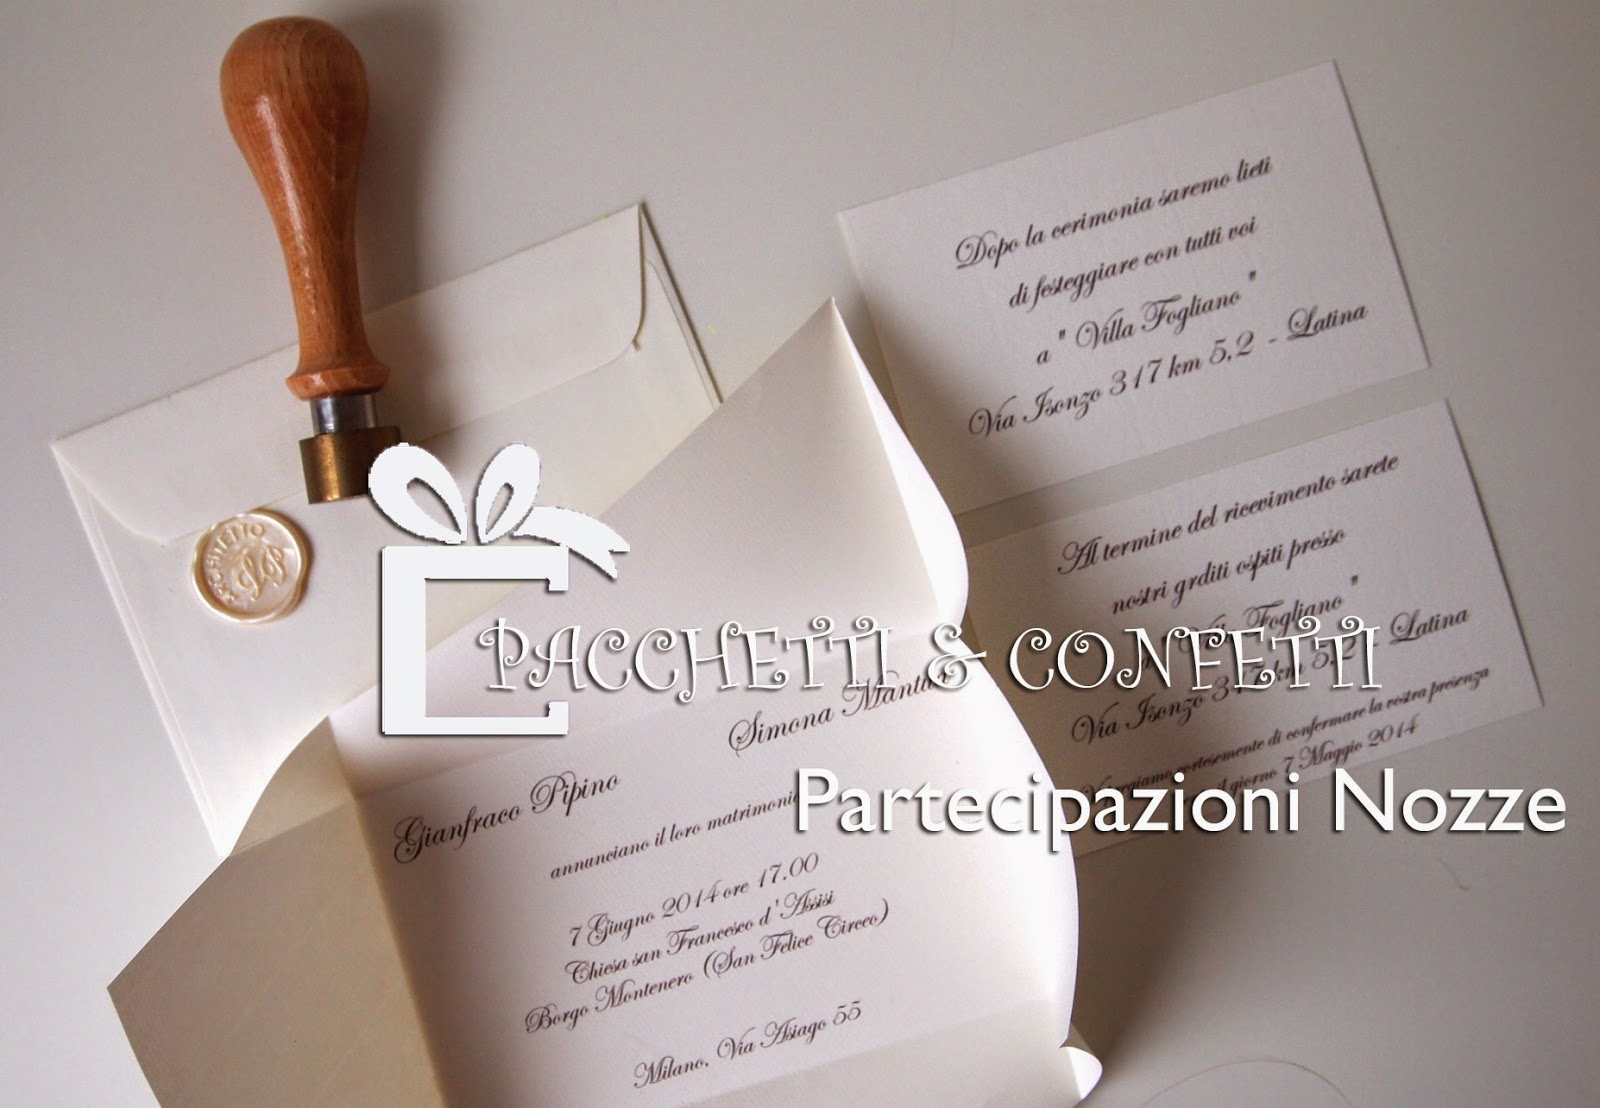 Frasi Auguri Matrimonio Originali : Frasi partecipazioni matrimonio originali